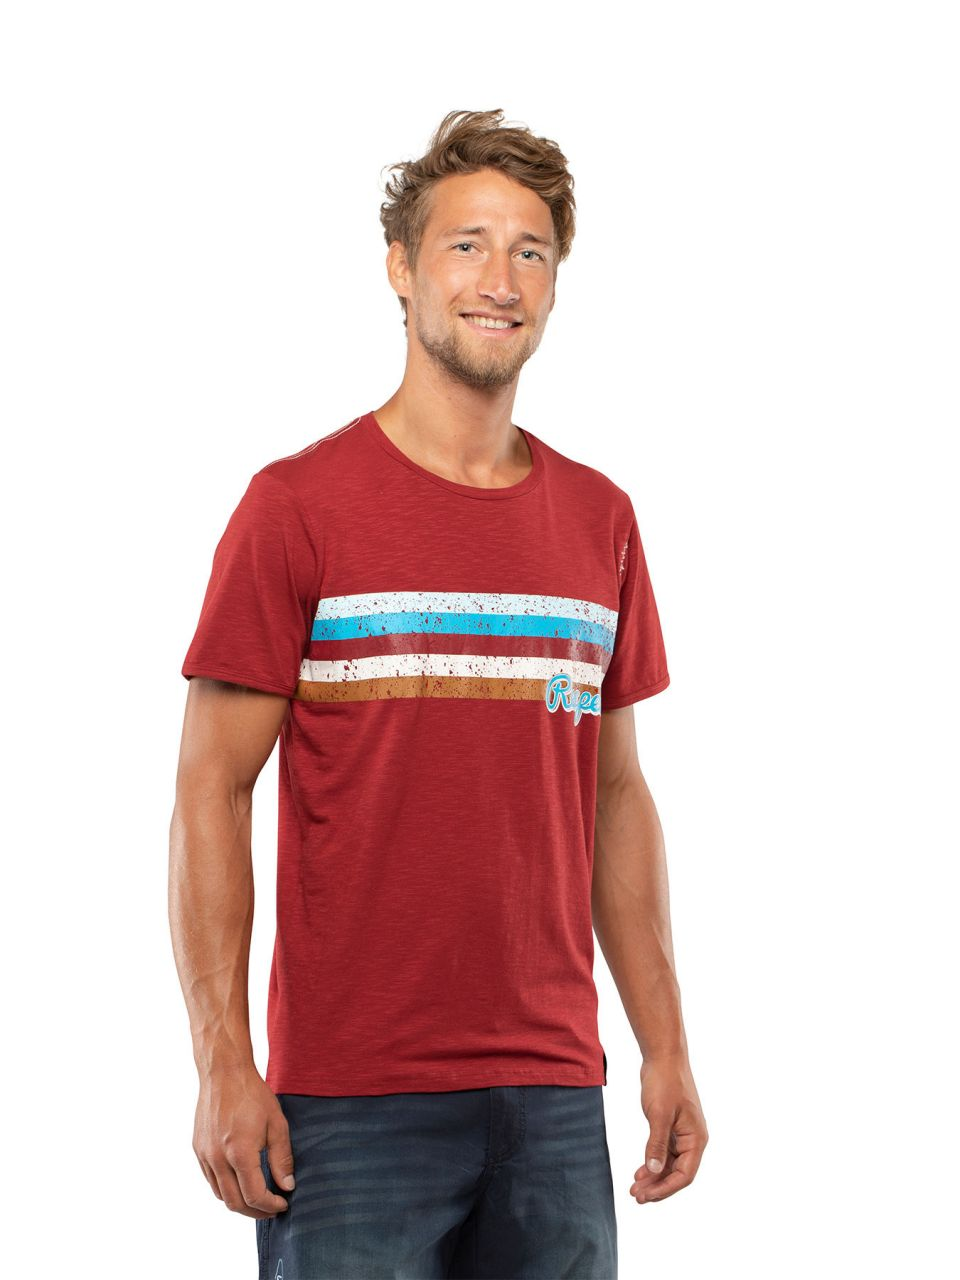 Chillaz Respect T-Shirt Man dark red S